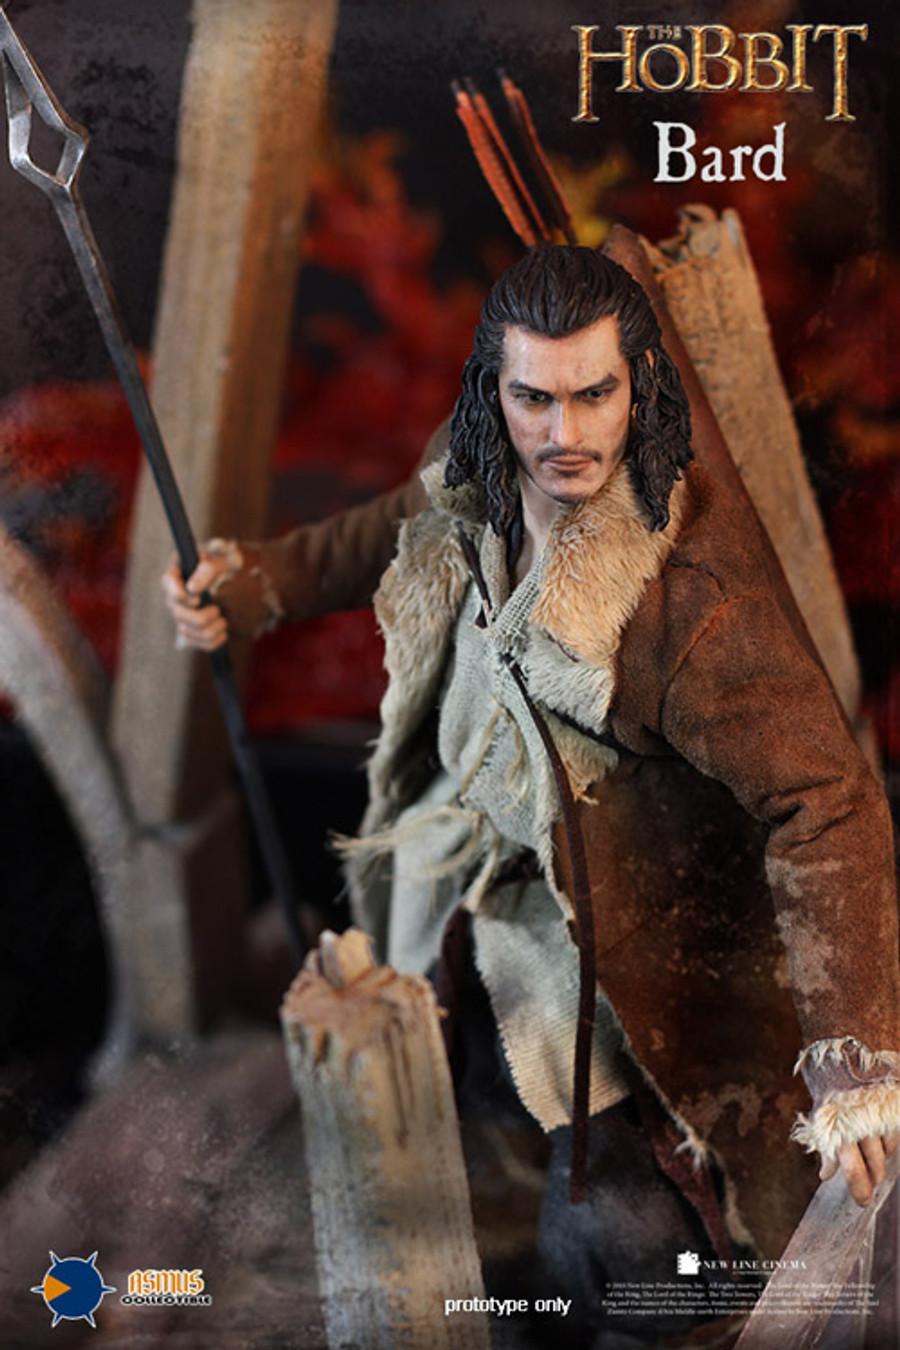 Asmus Toys - The Hobbit Series: Bard